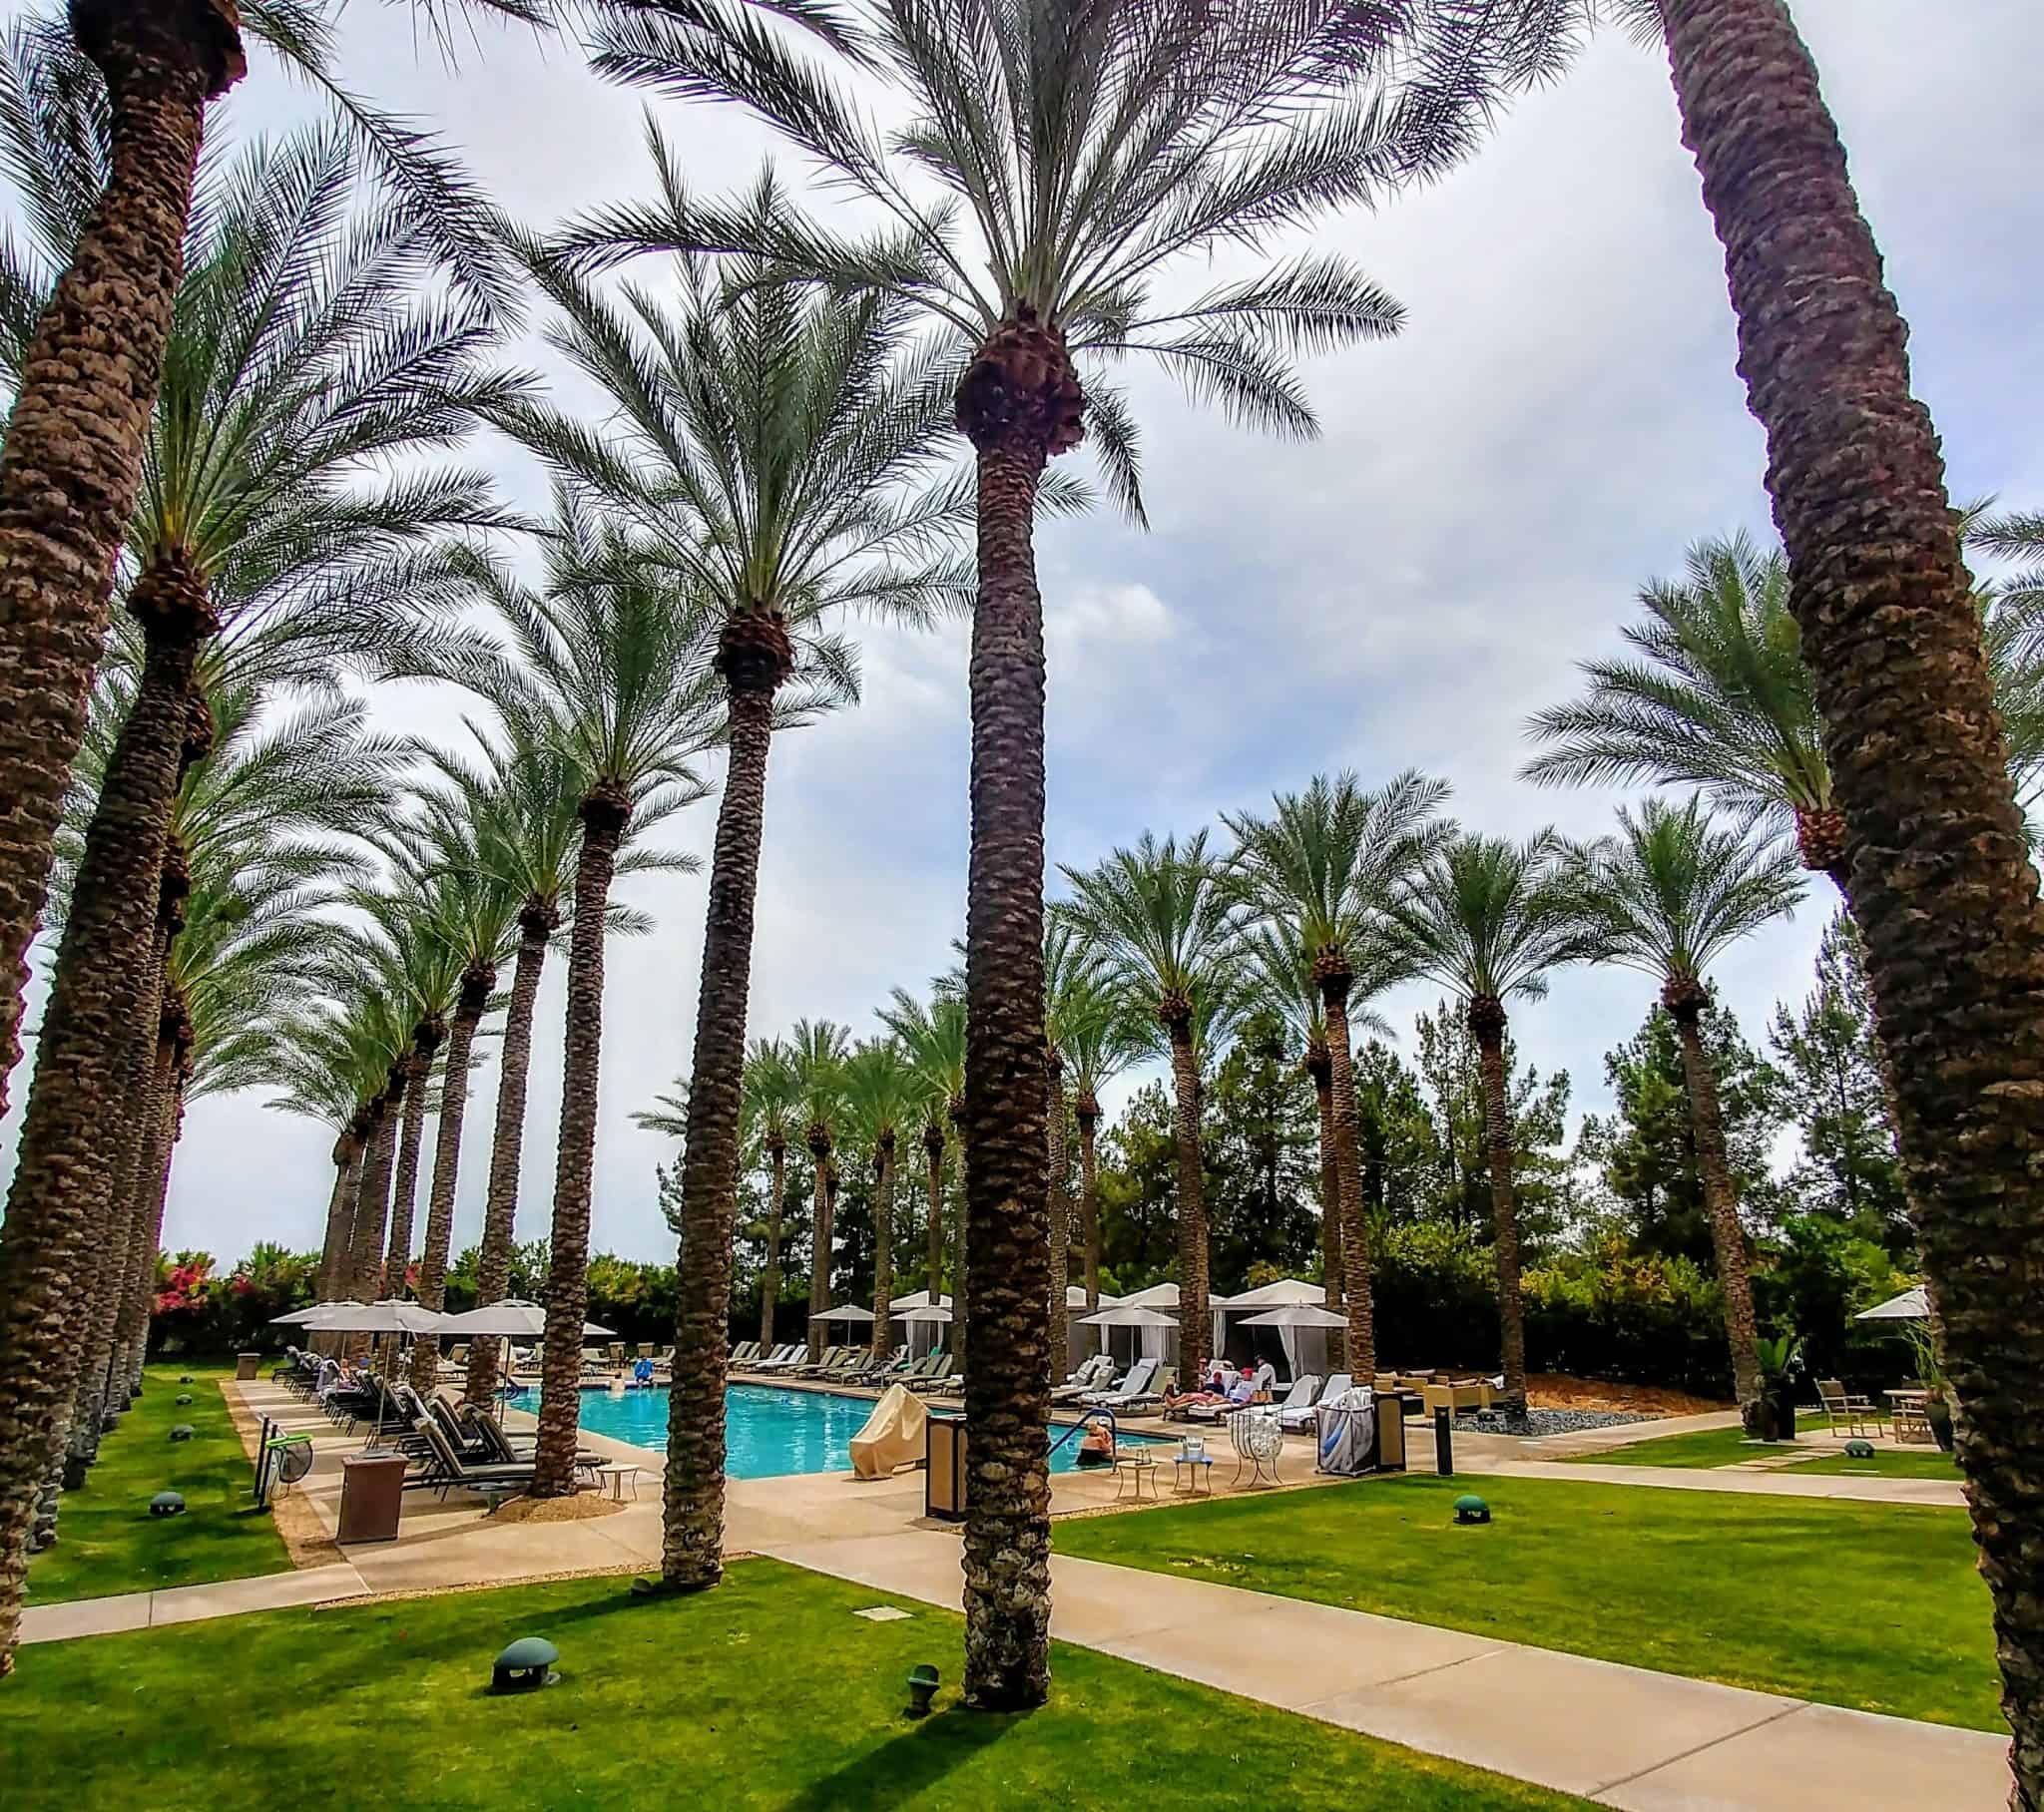 JW Marriott Scottsdale Arizona Pool Area with palm trees and umbrellas